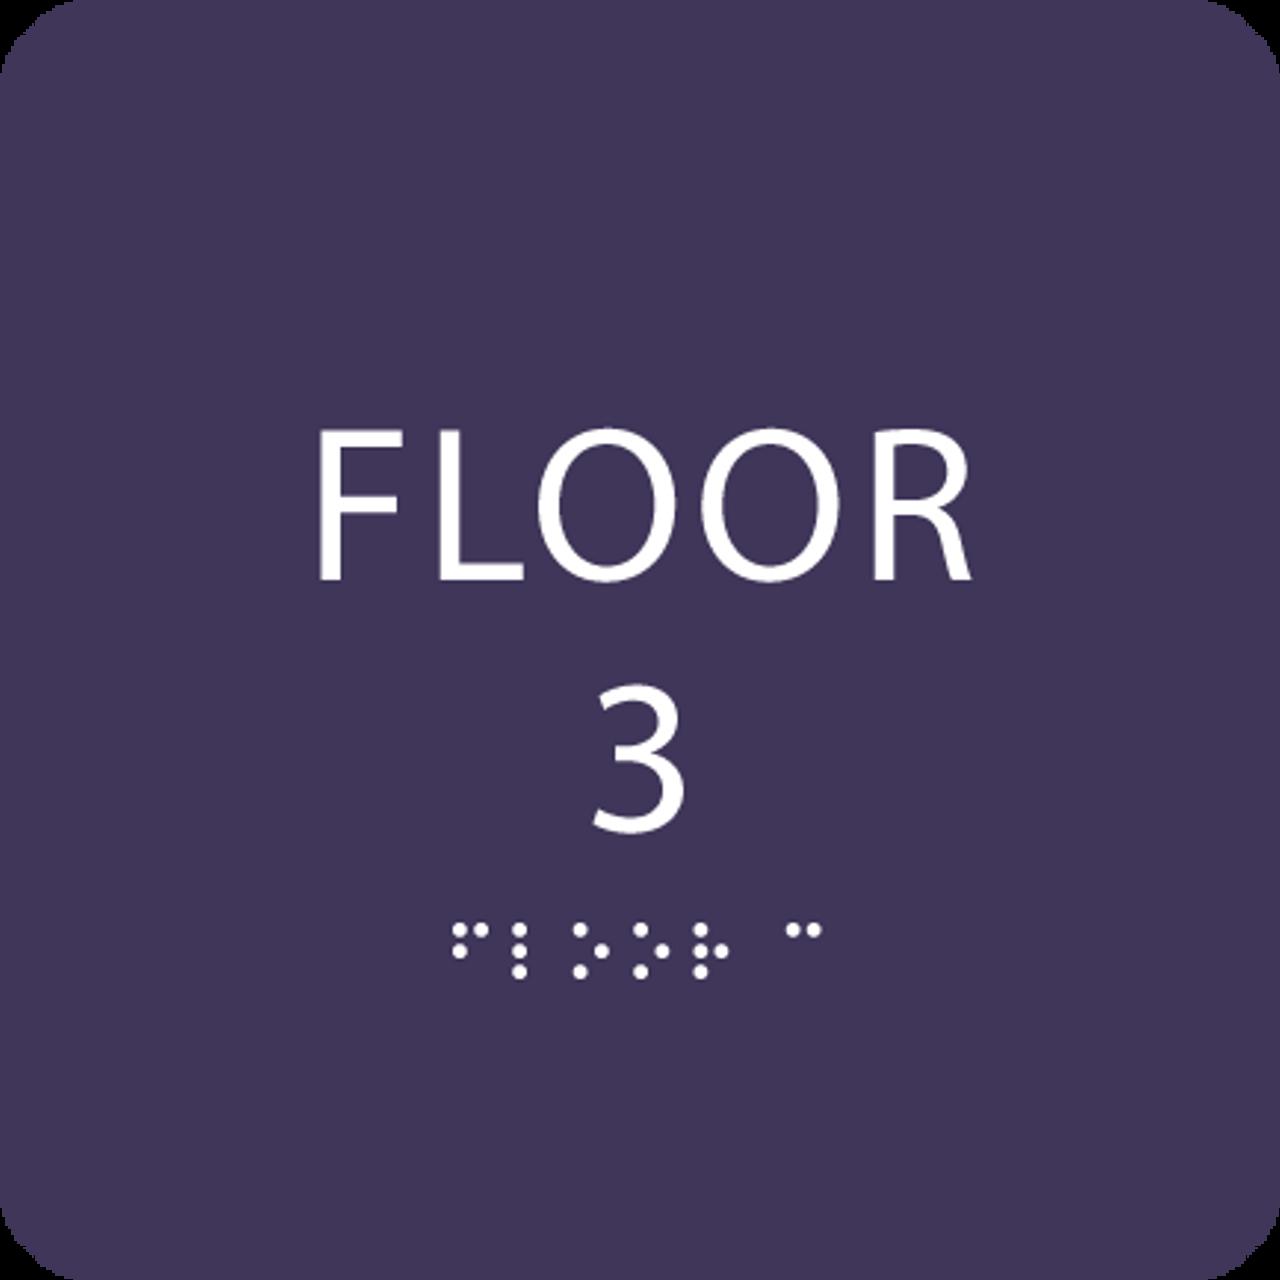 Purple Floor 3 Identification Sign